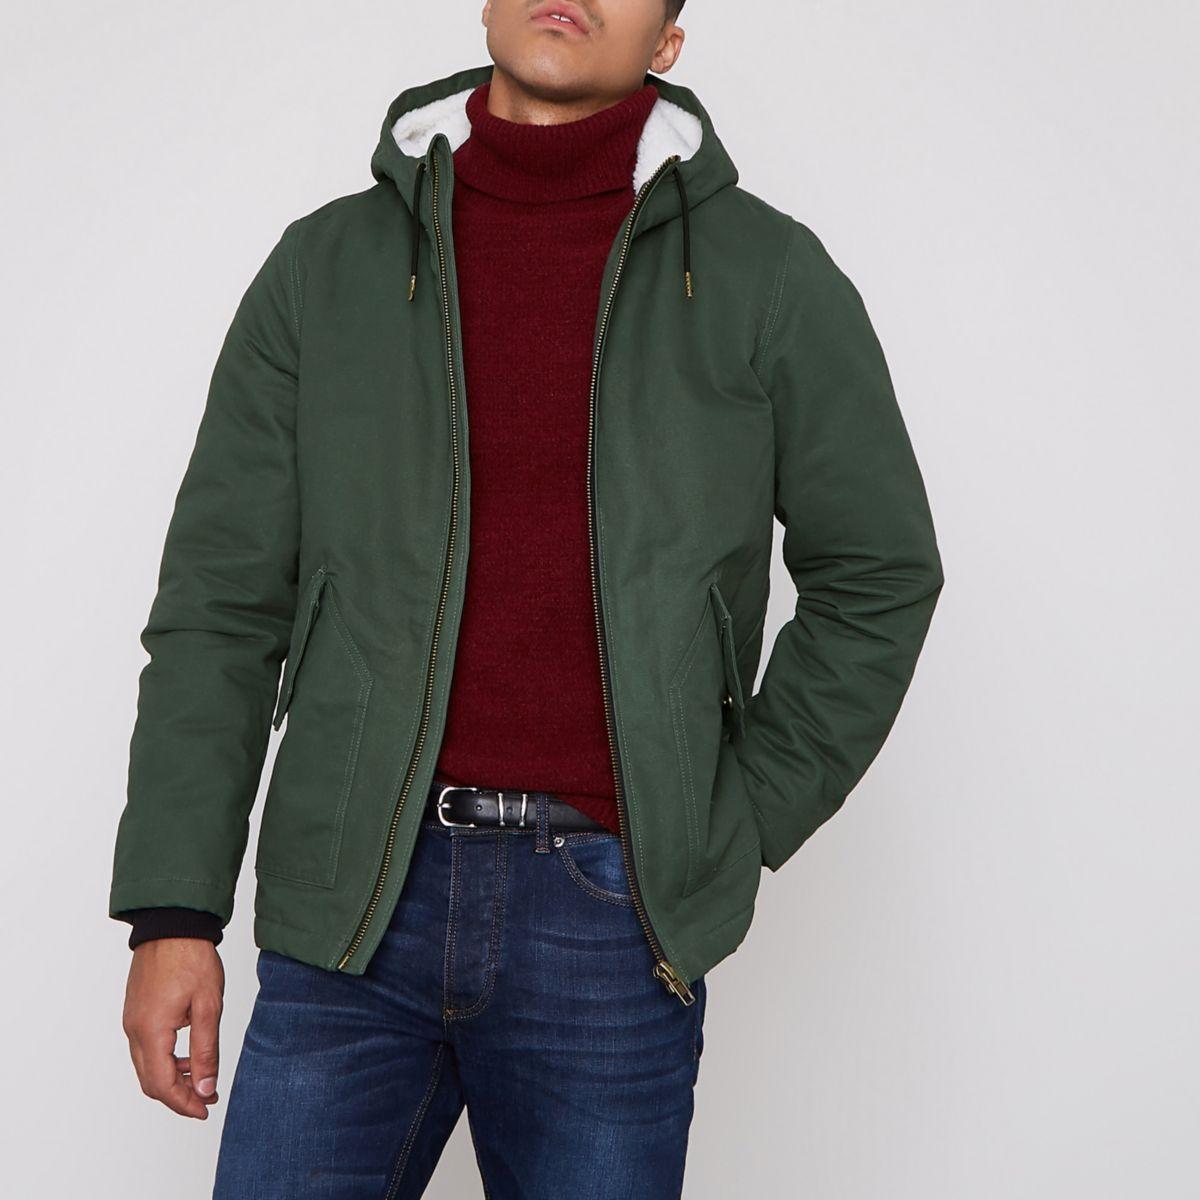 Green fleece lined hooded jacket